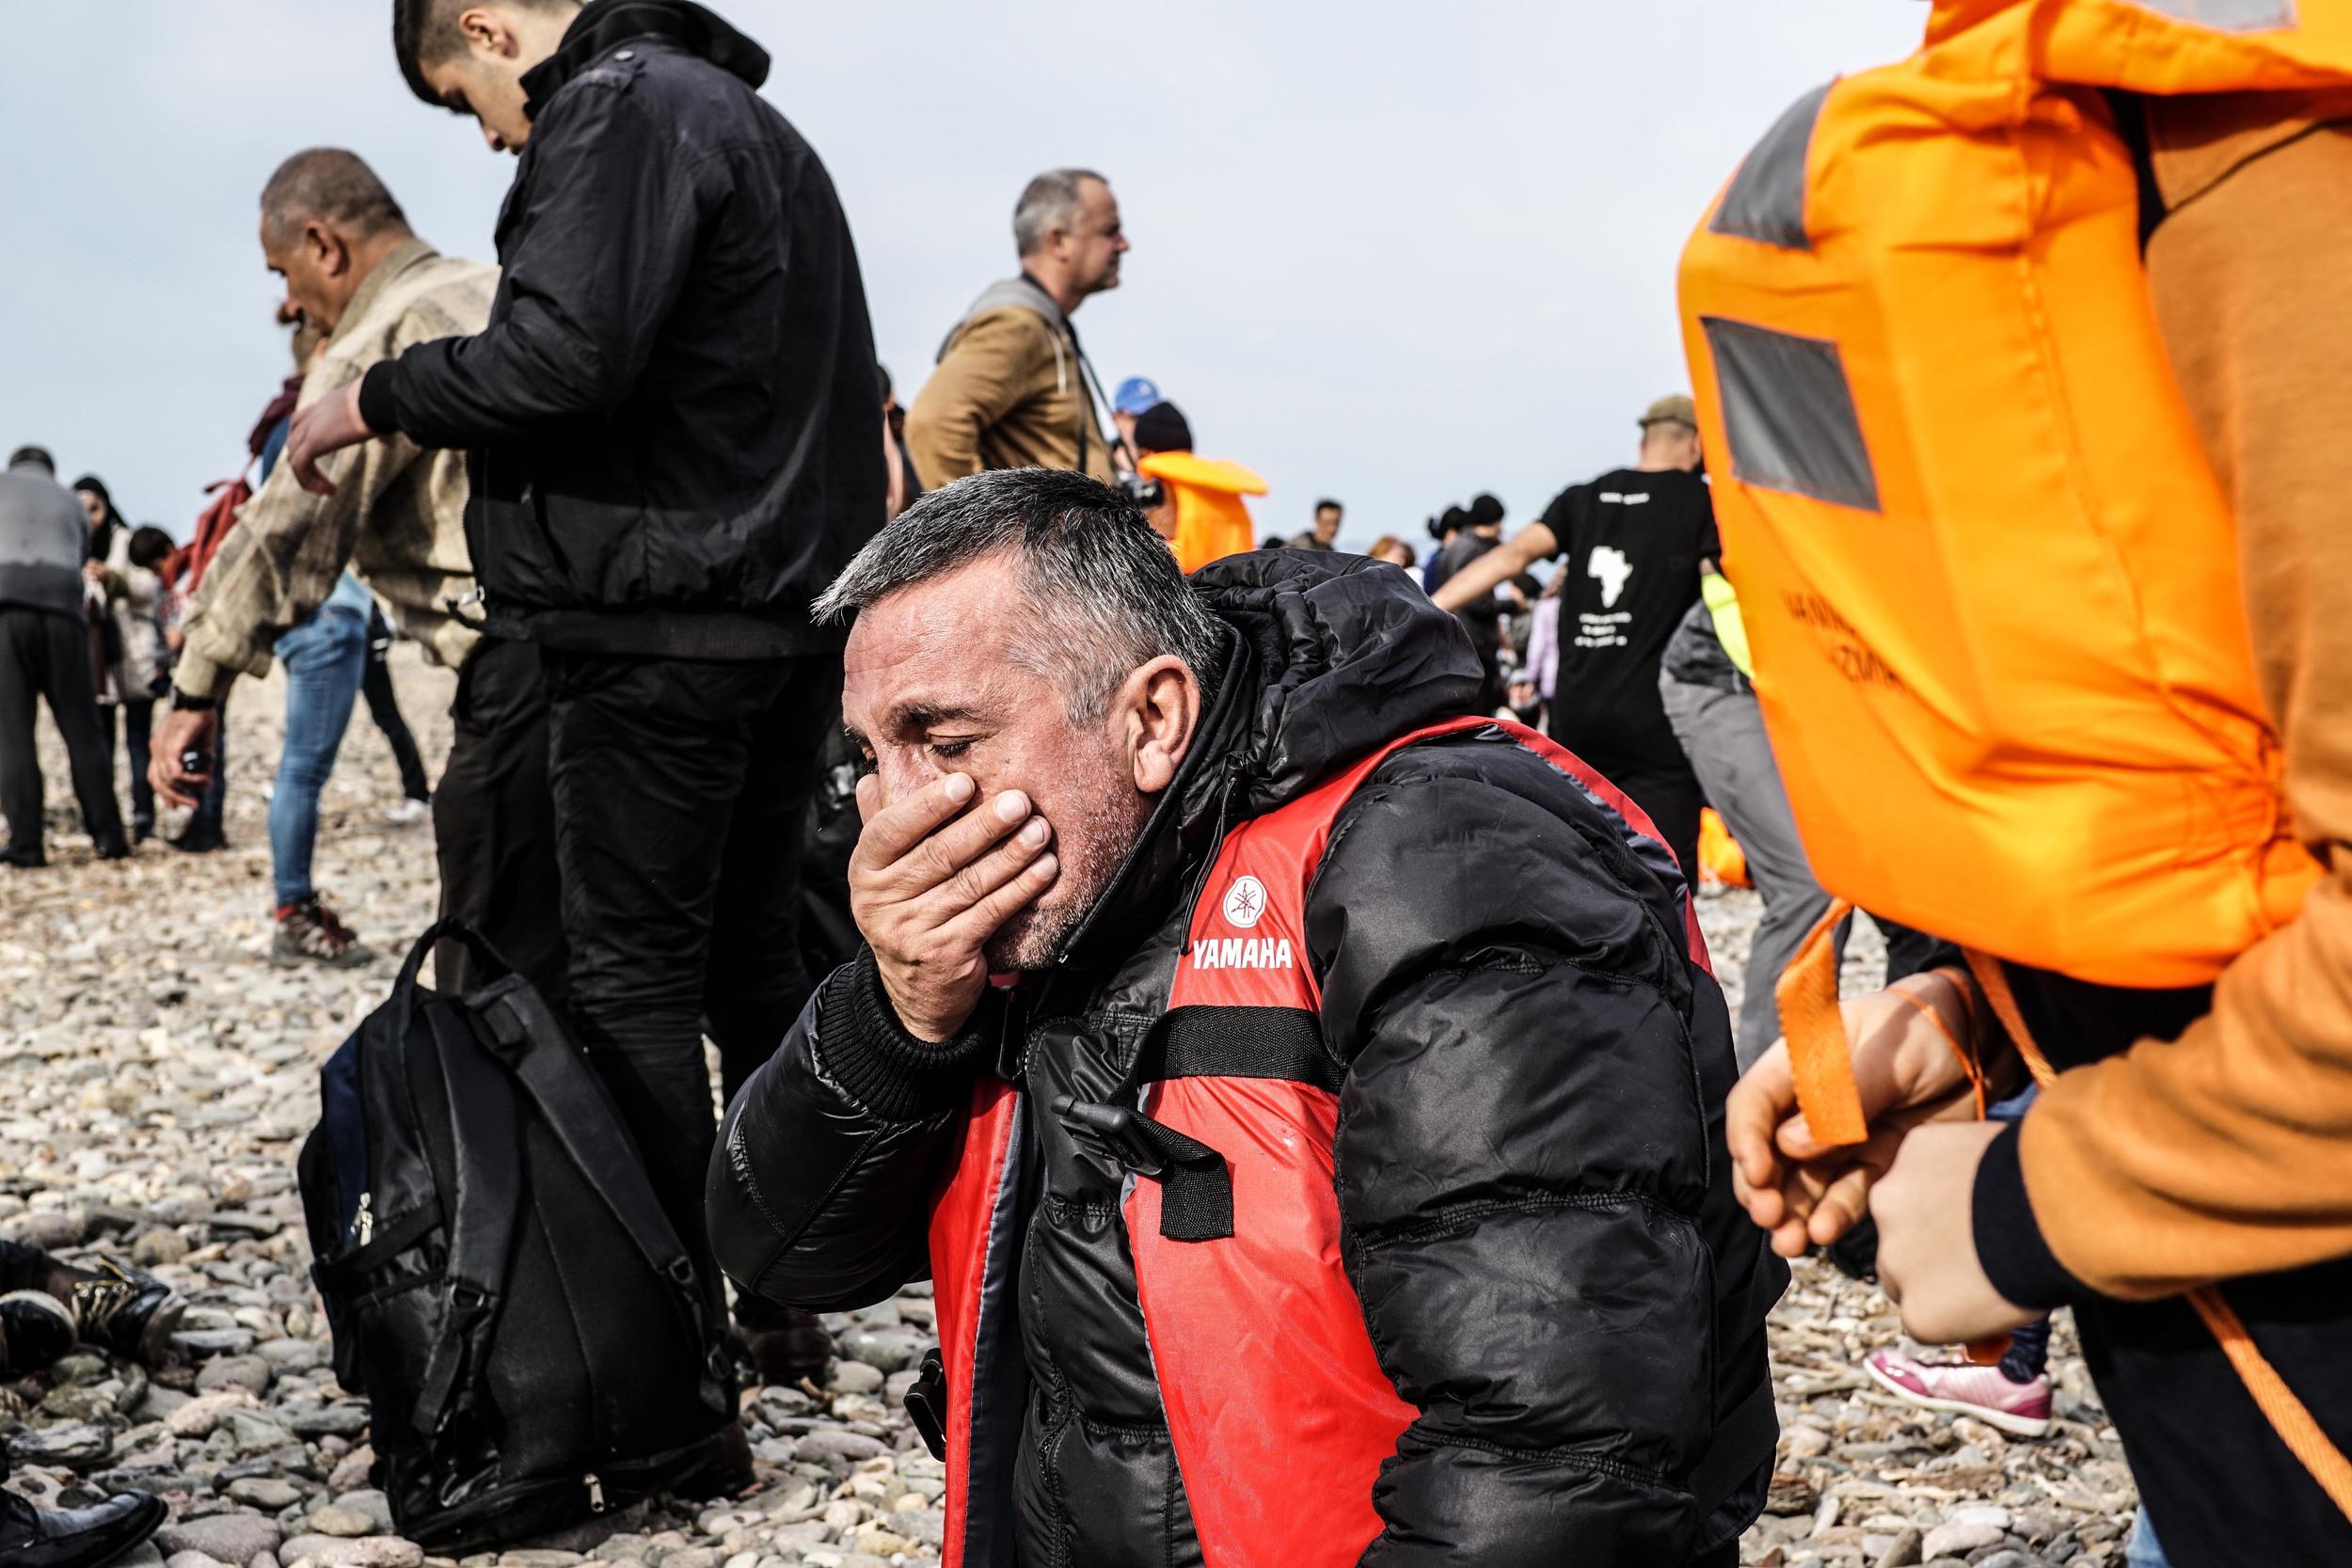 Syrian Refugee Crisis Lesbos Greece November 2015 18.jpg